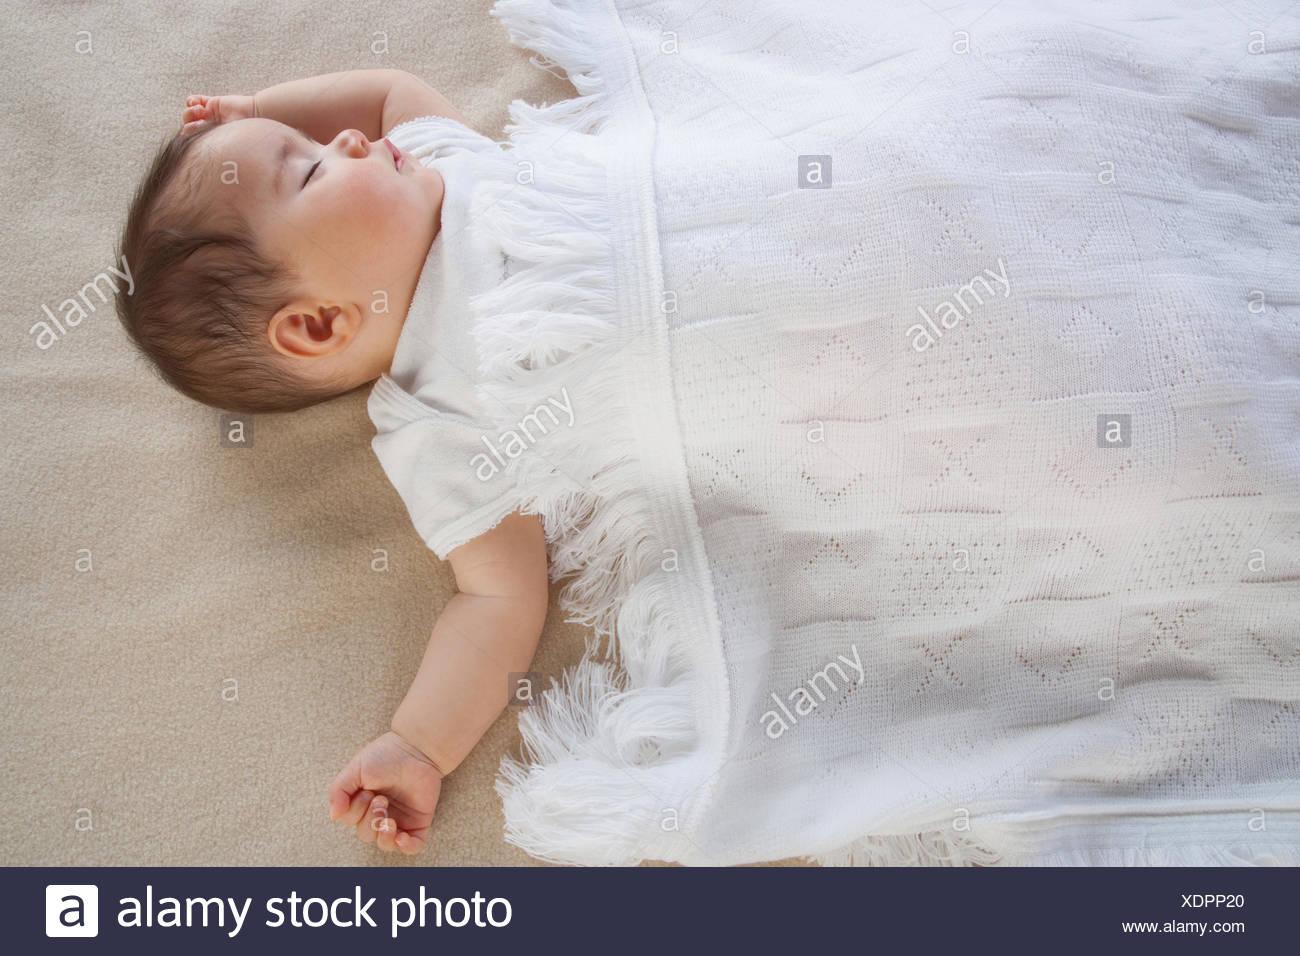 A baby sleeping - Stock Image